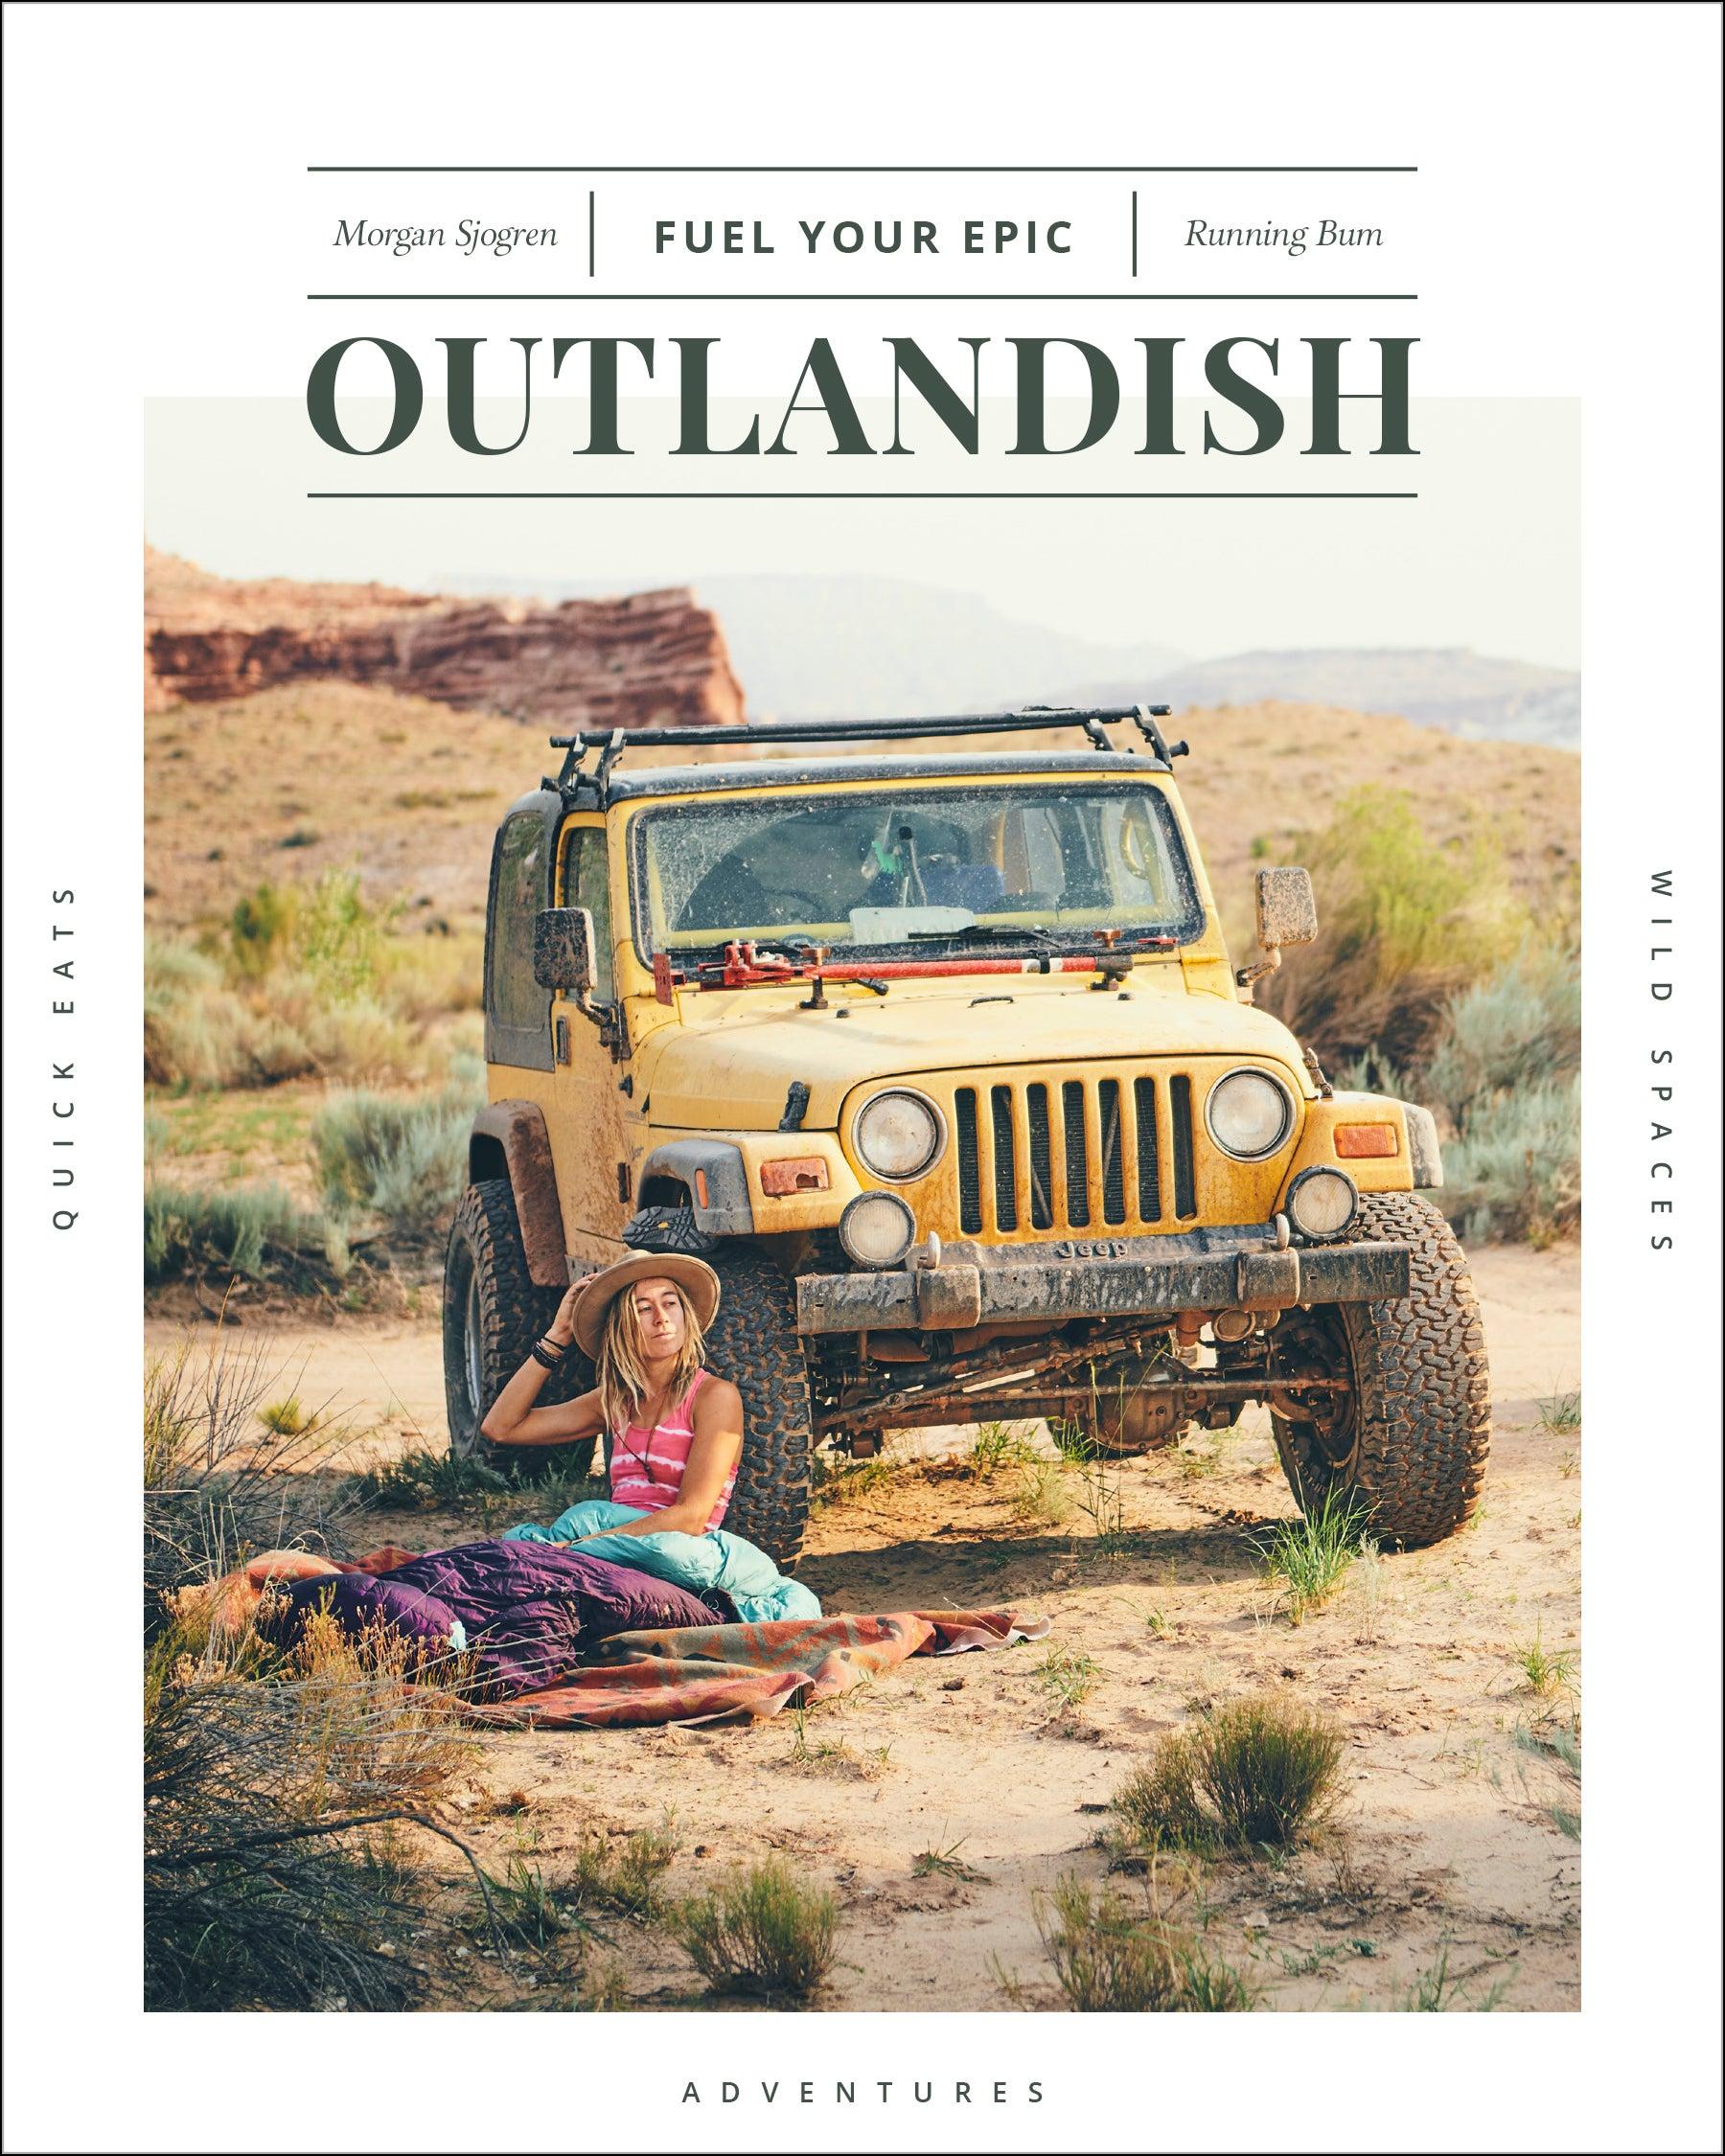 Outlandish by Morgan Sjogren, The Running Bum